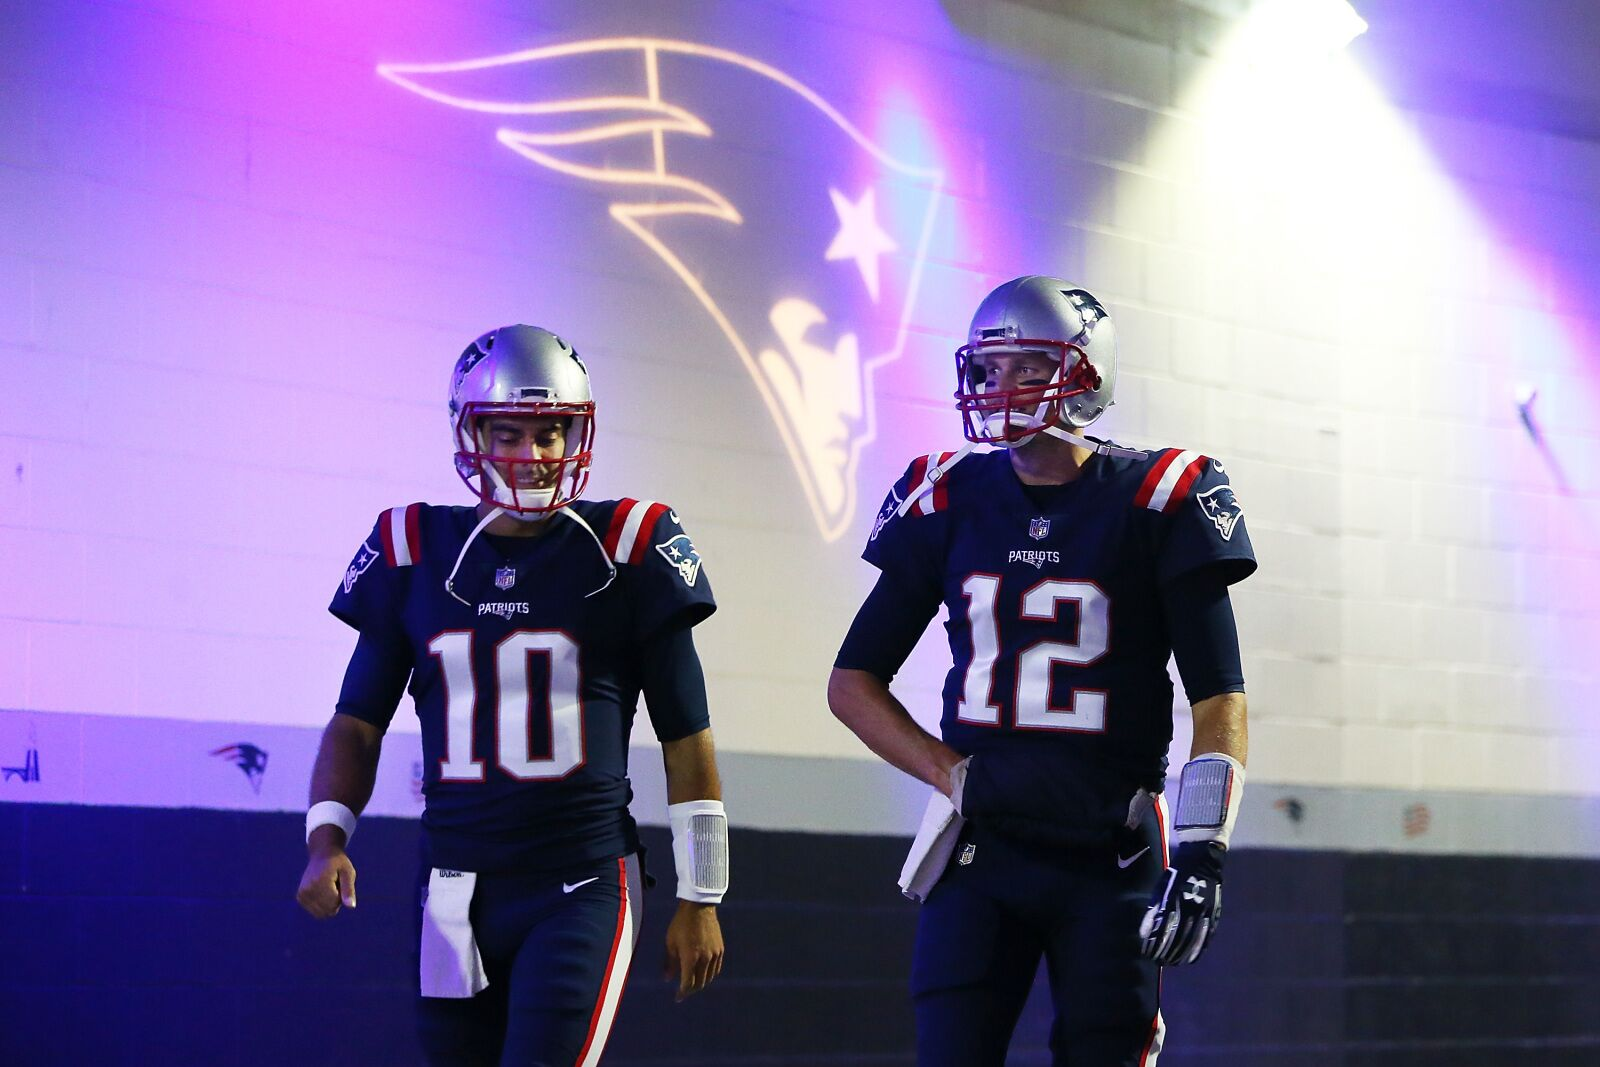 New England Patriots: Trading Jimmy Garoppolo wasn't a mistake